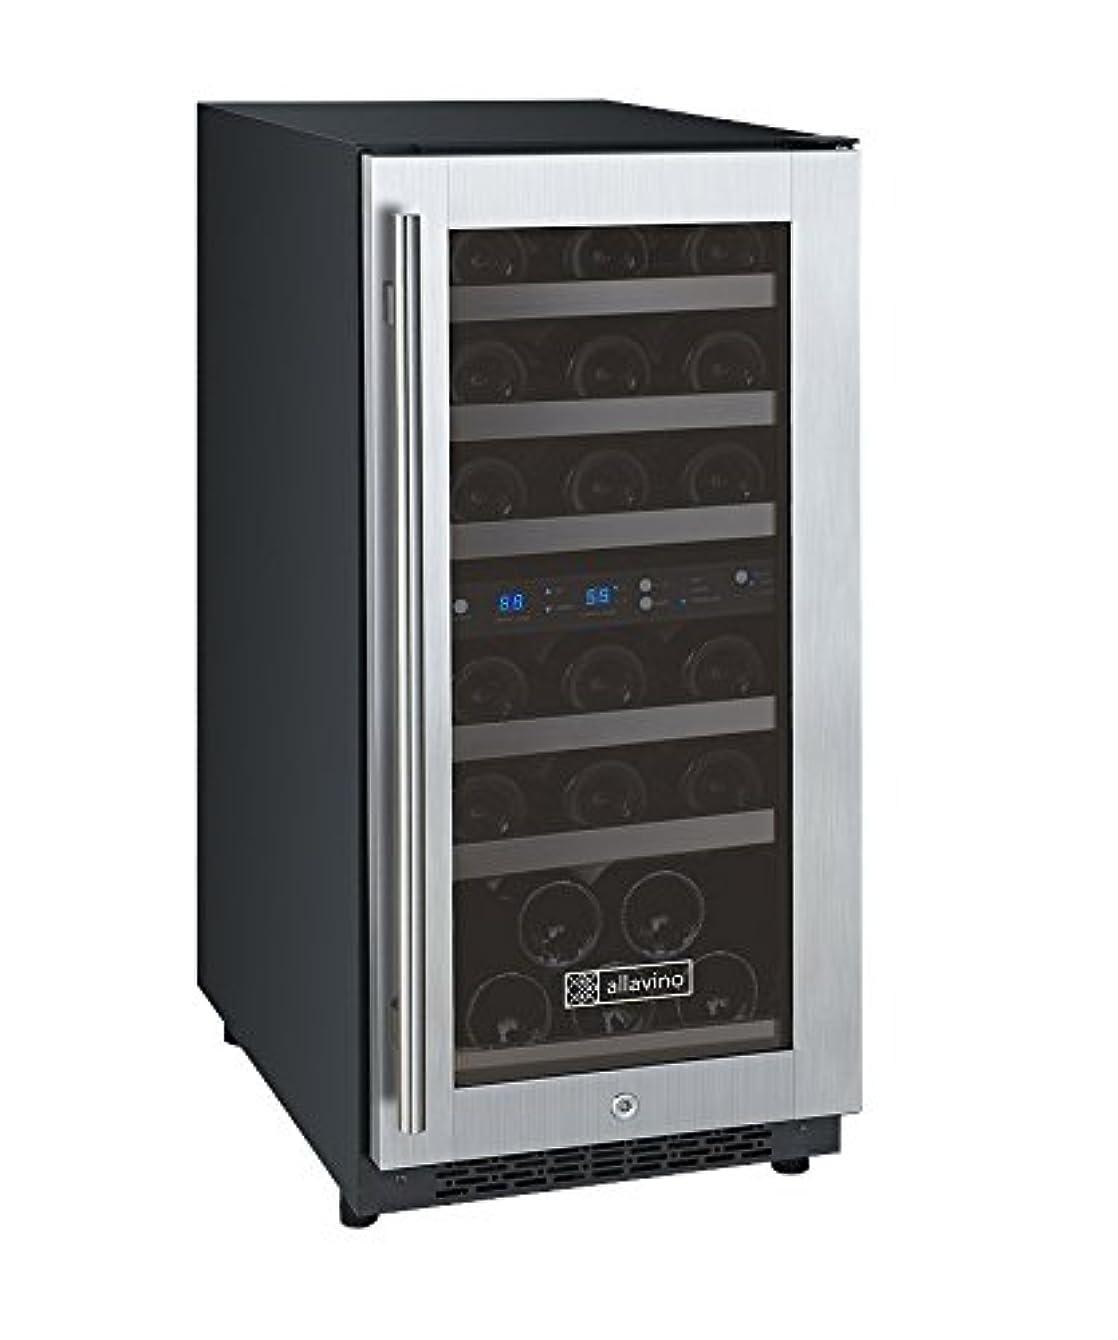 Allavino VSWR30-2SSRN - 30 Bottle Dual-Zone Wine Refrigerator - Towel Bar Handle